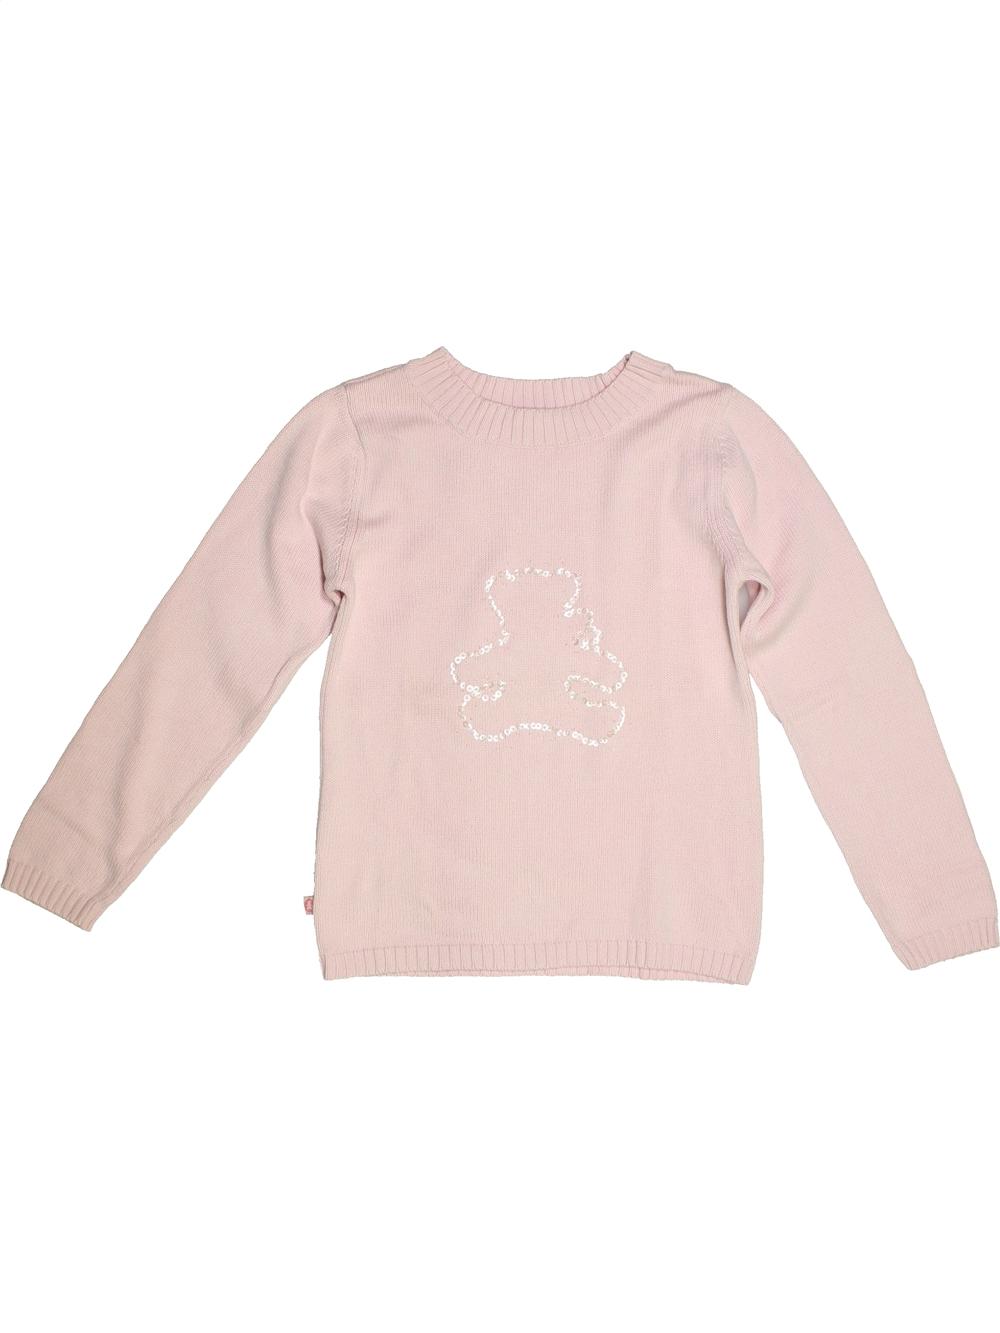 Pull-enfant-fille-LULU-CASTAGNETTE-12-ans-blanc-hiver-vetement-bebe-112654